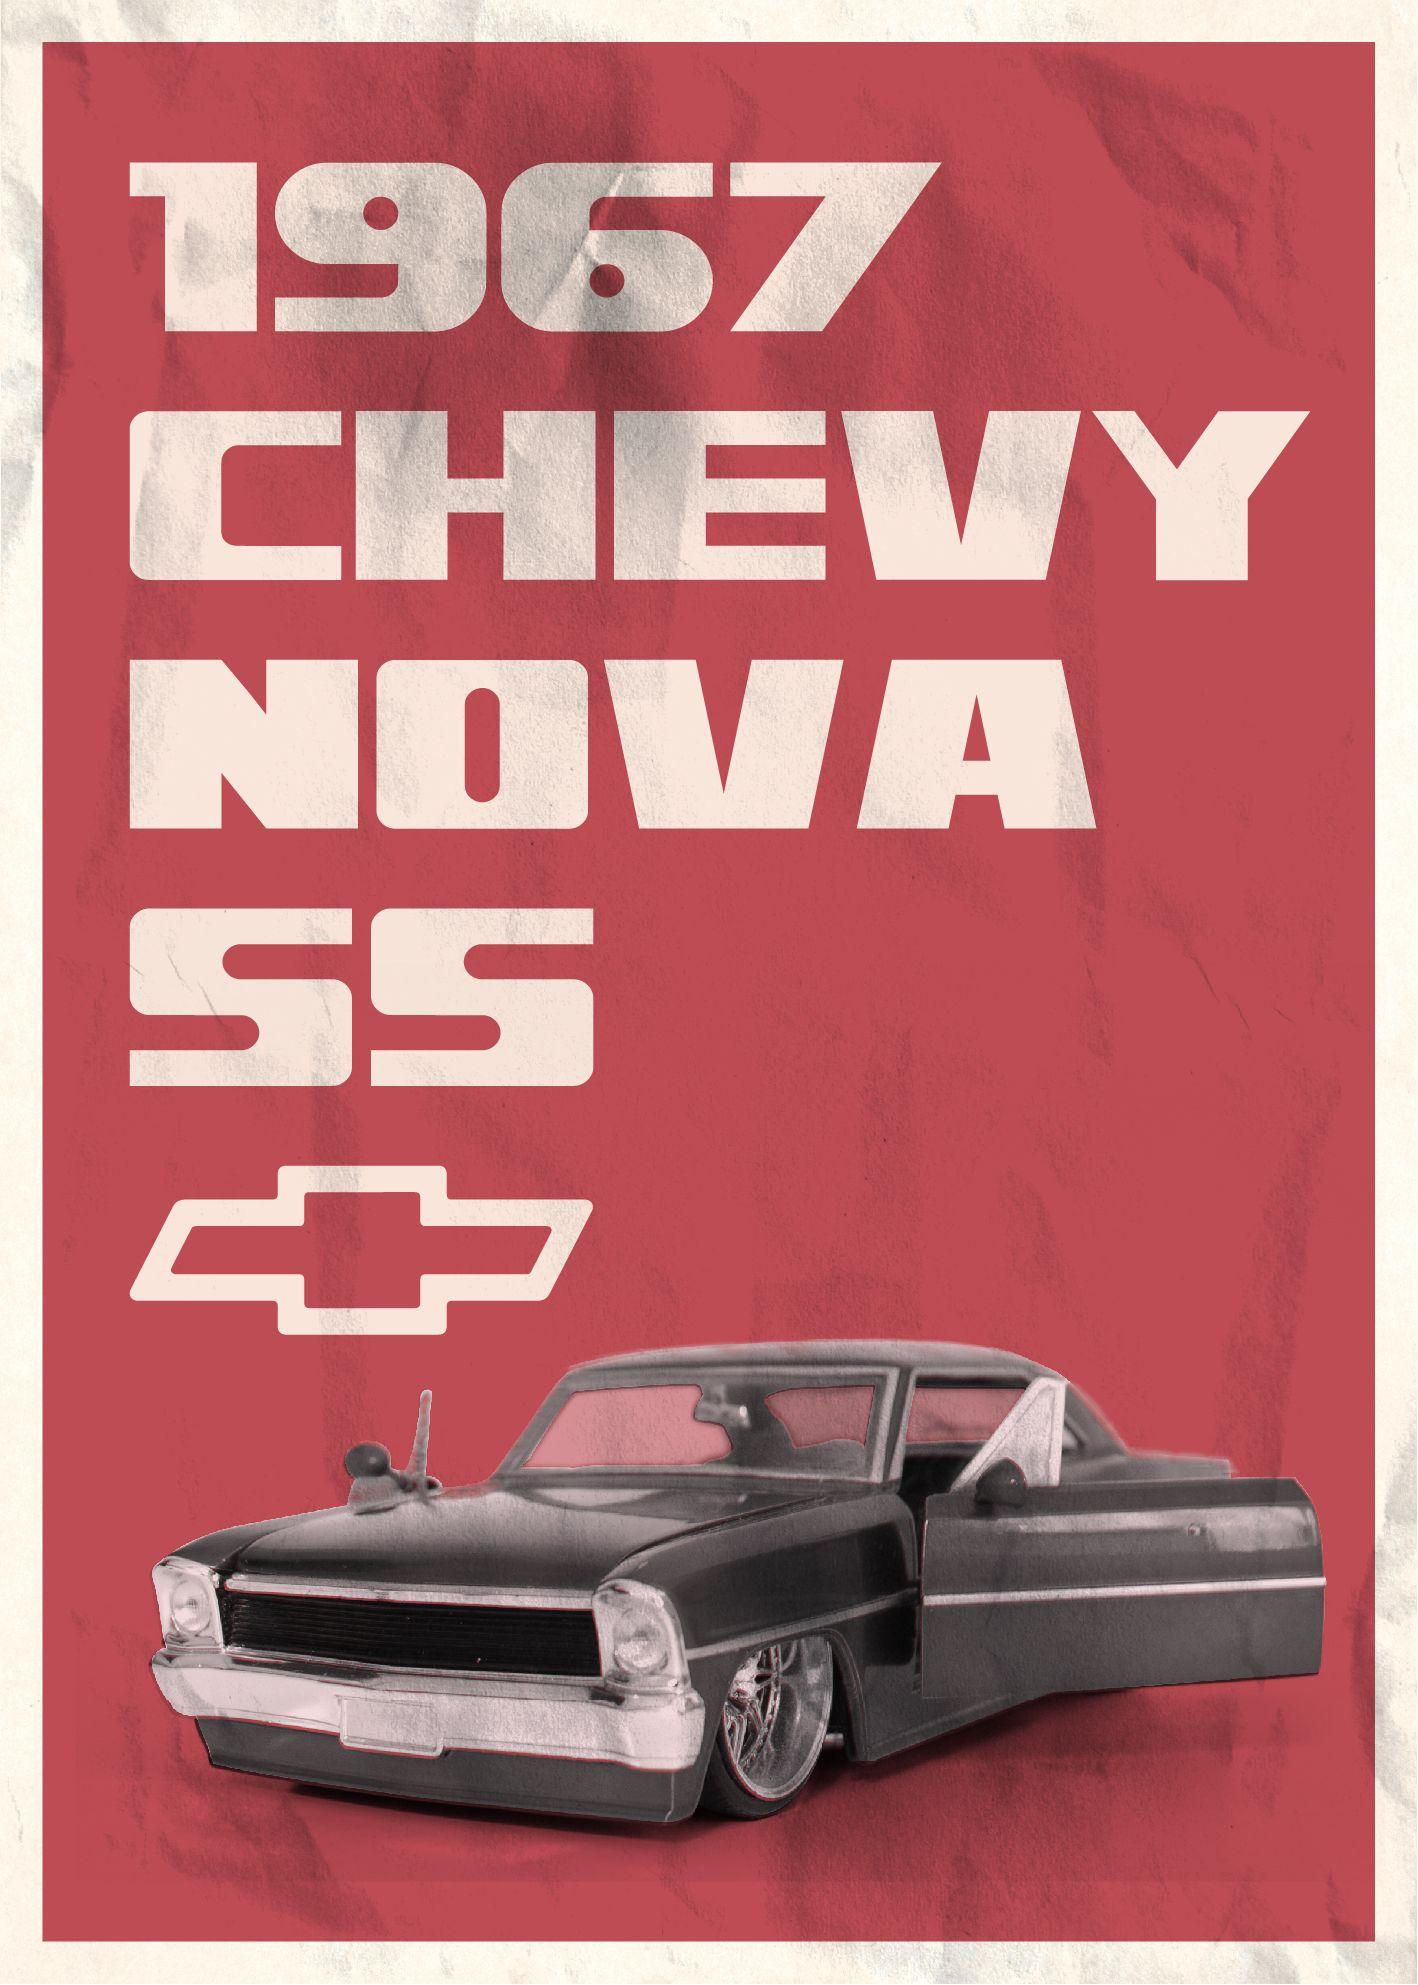 1965 chevy ii nova ss favorite cars american muscle pinterest - 1967 Chevy Nova Ss